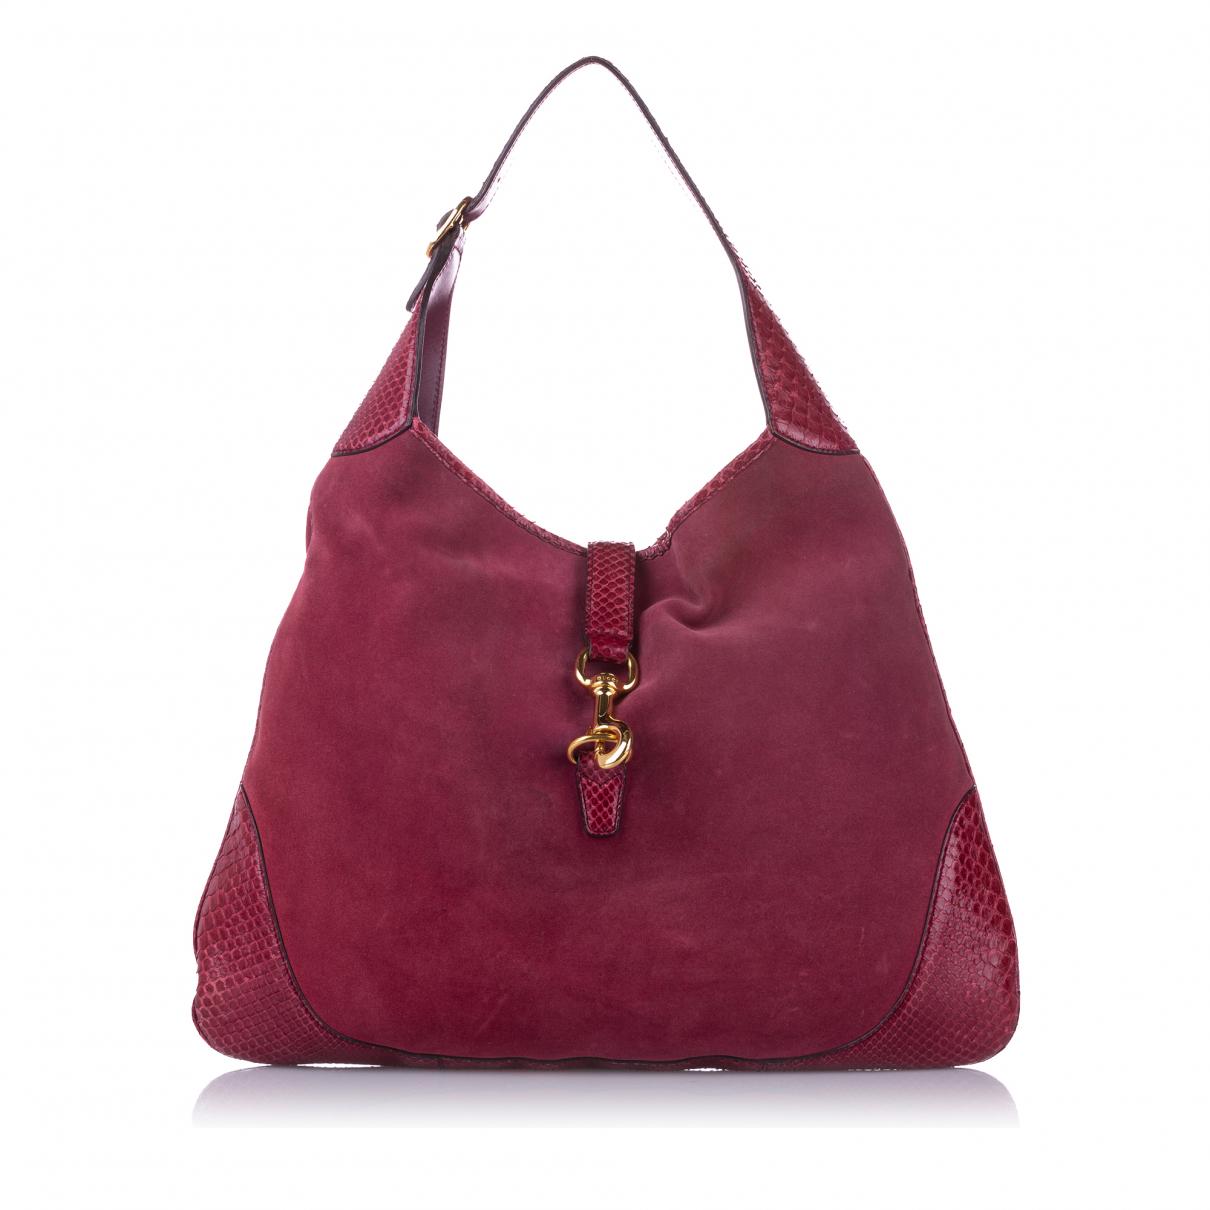 Gucci - Sac a main   pour femme en cuir - rose